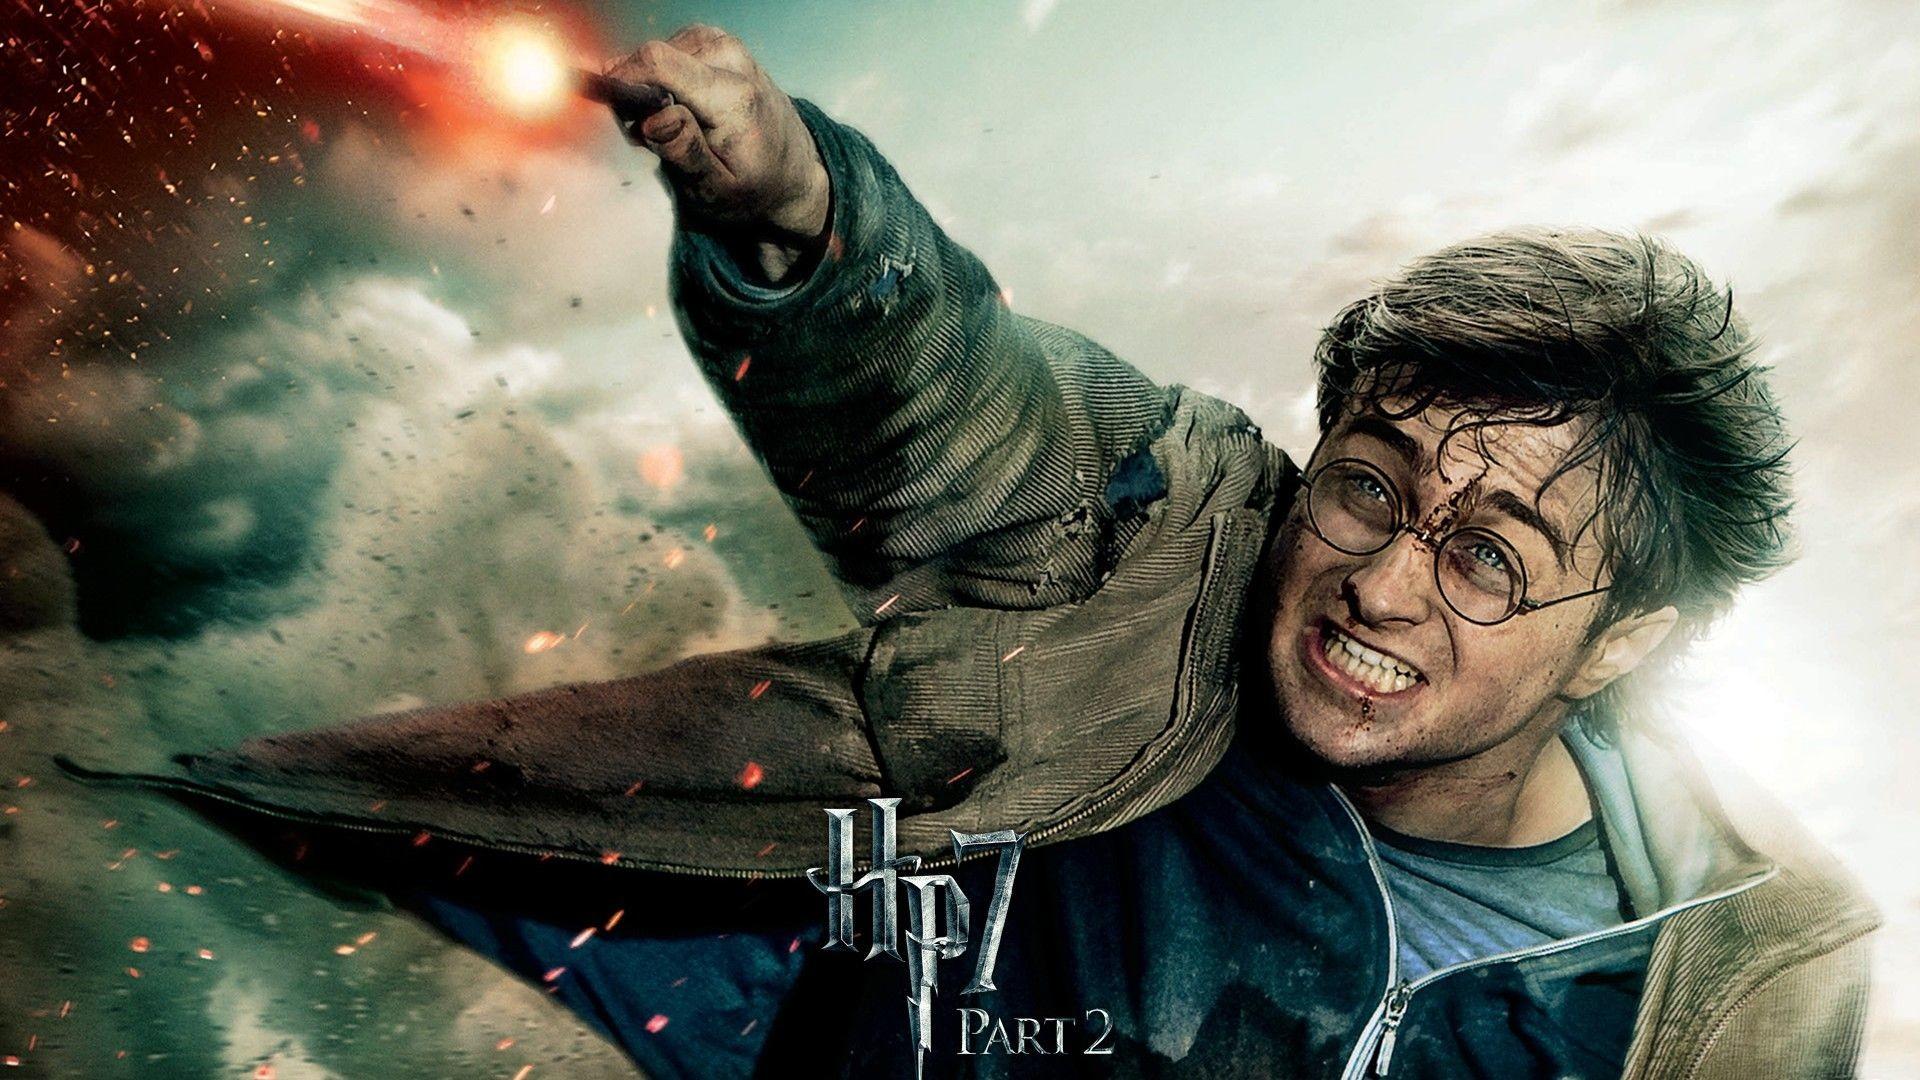 Harry Potter 1080p Wallpaper, Picture, Image